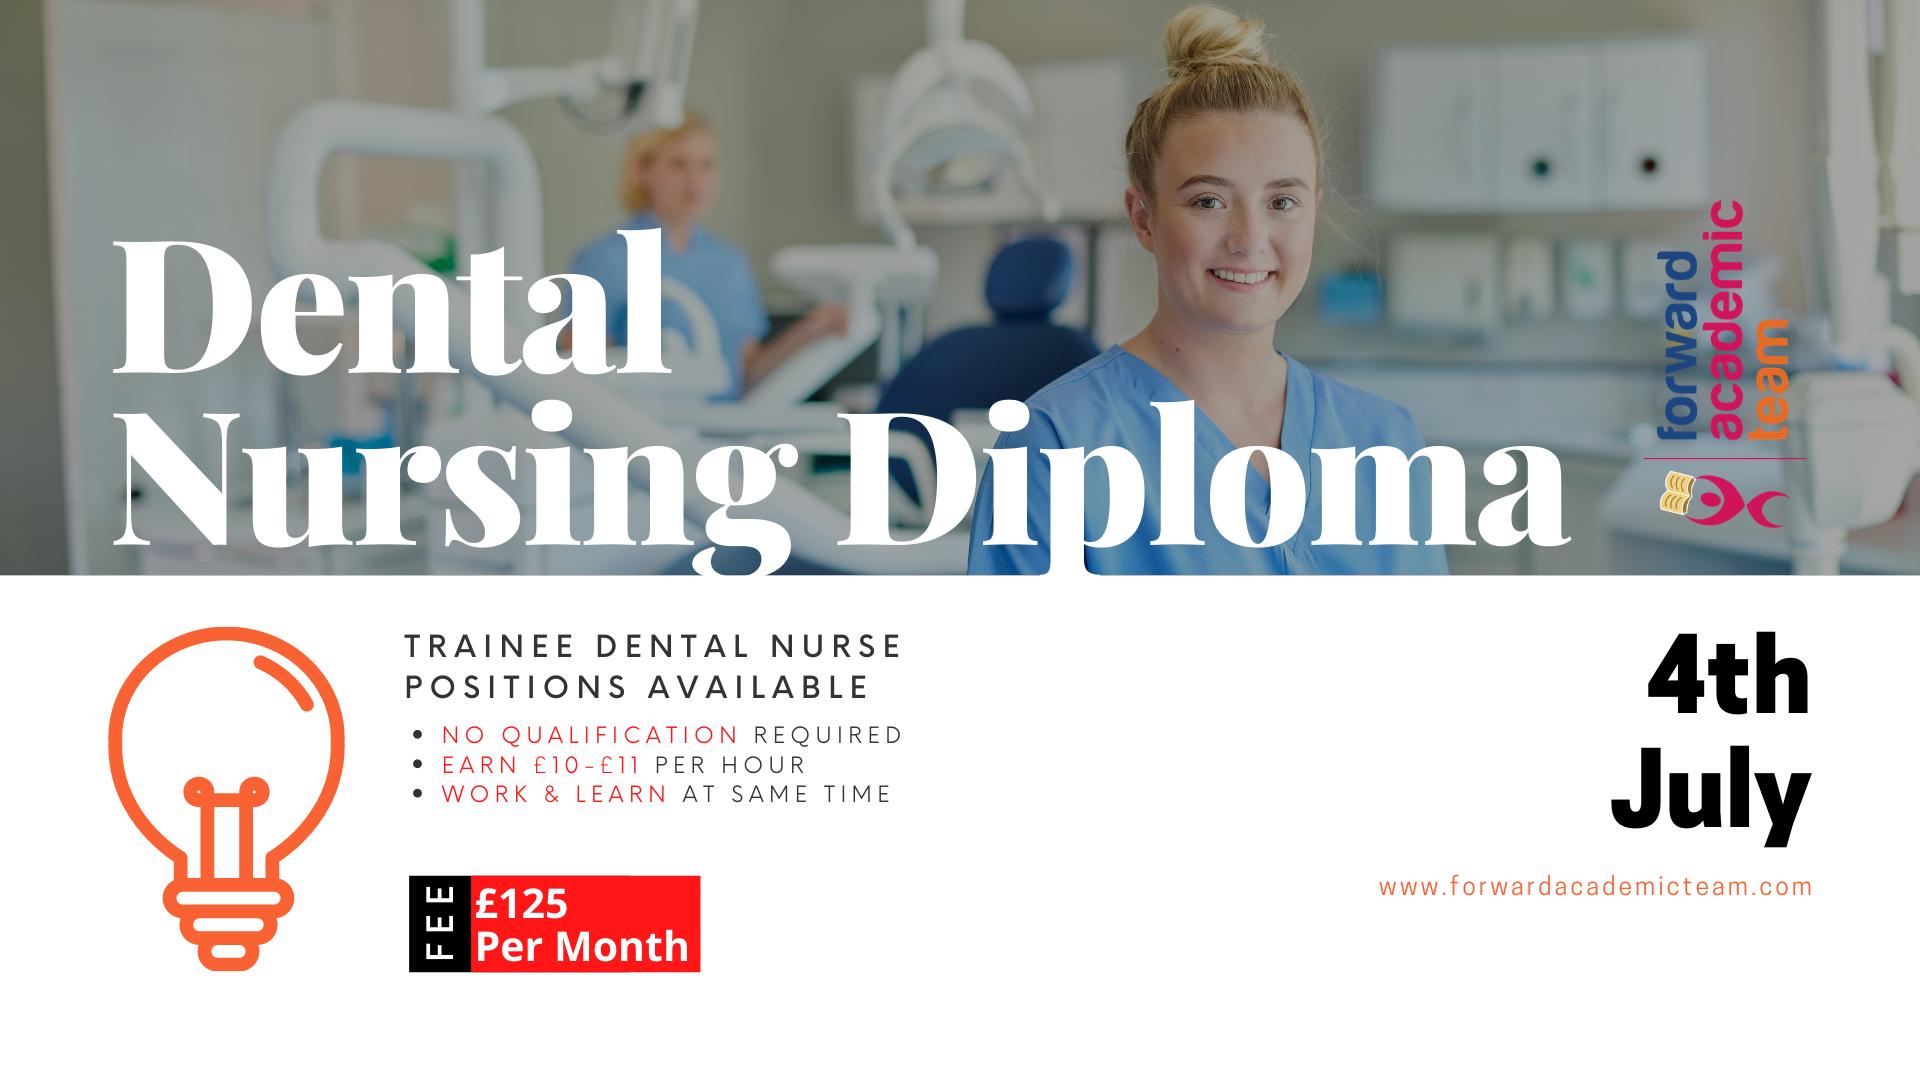 Dental Courses in London